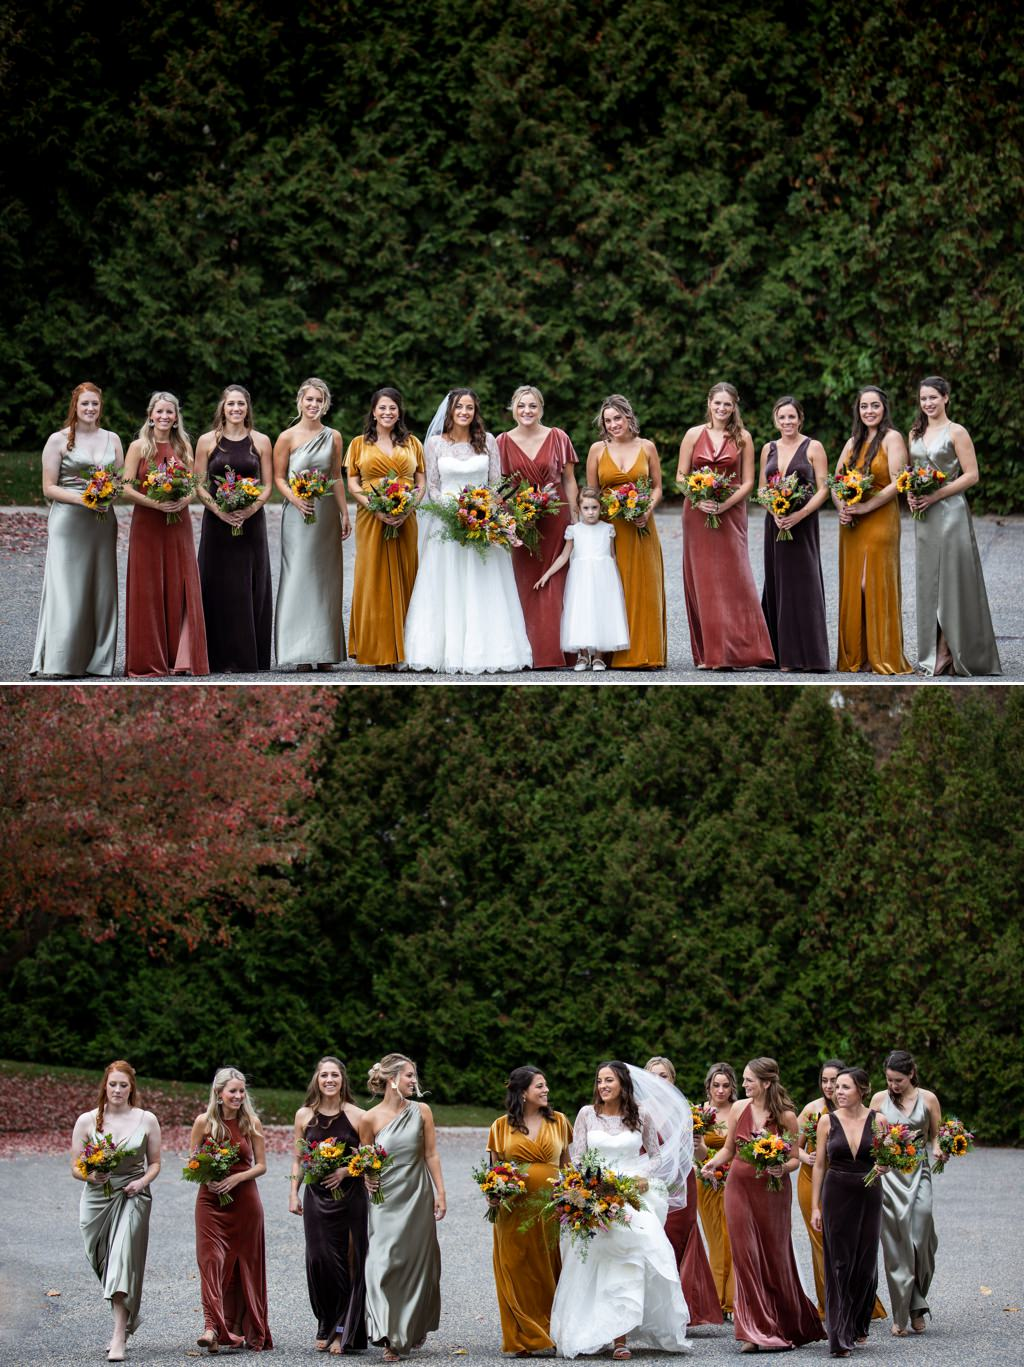 bridesmaids wearing fall color dresses walking and posing